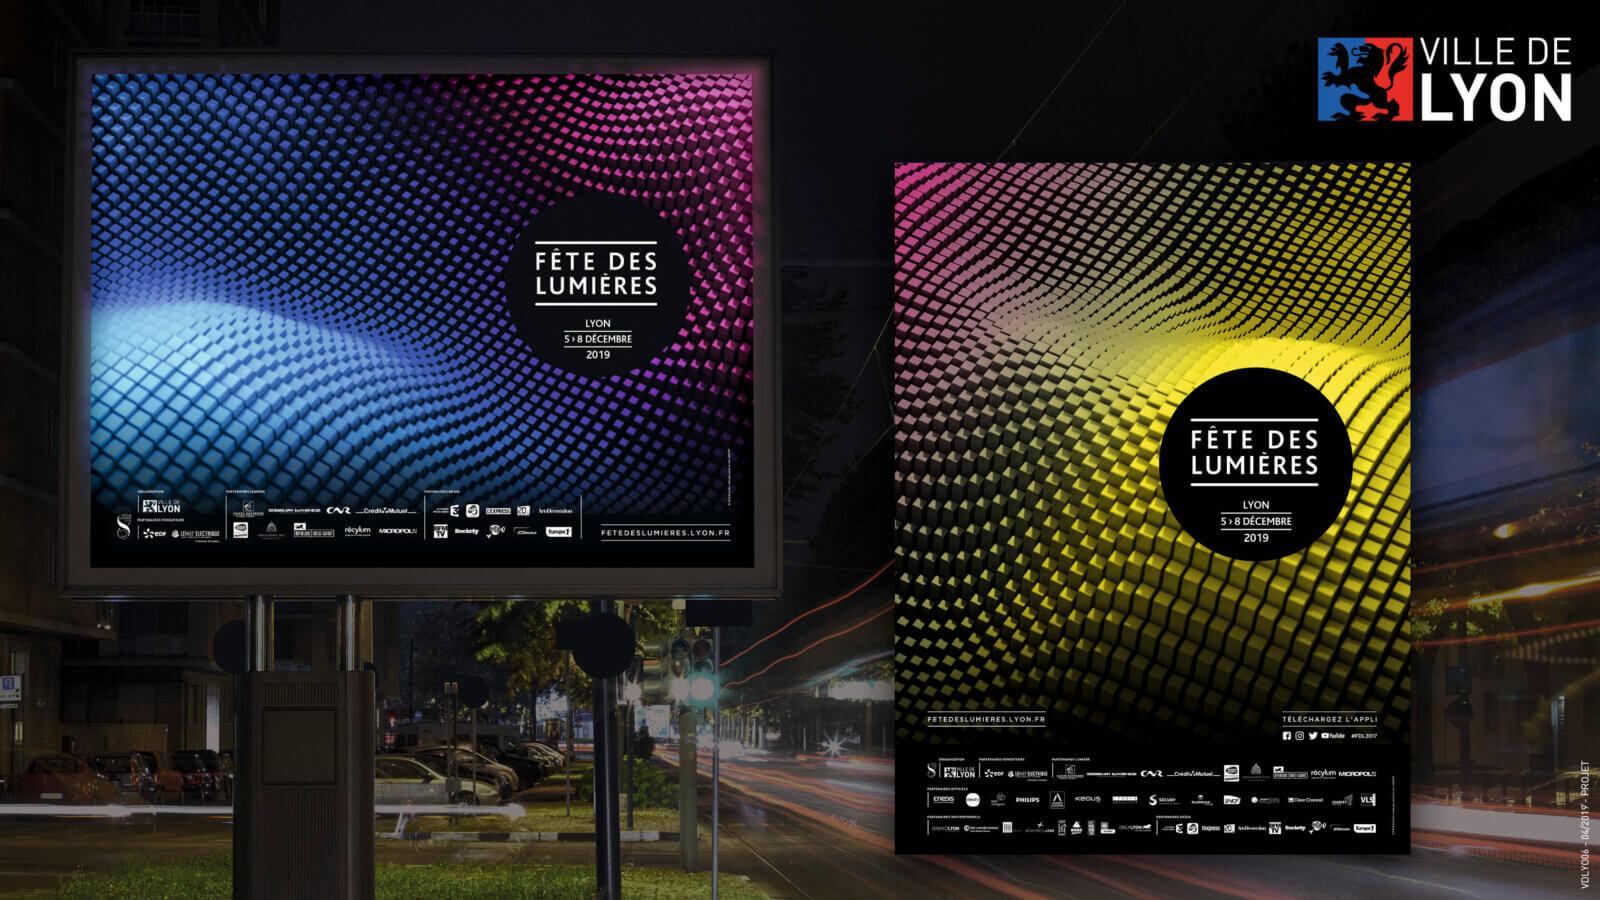 campagne promotion fdl lyon